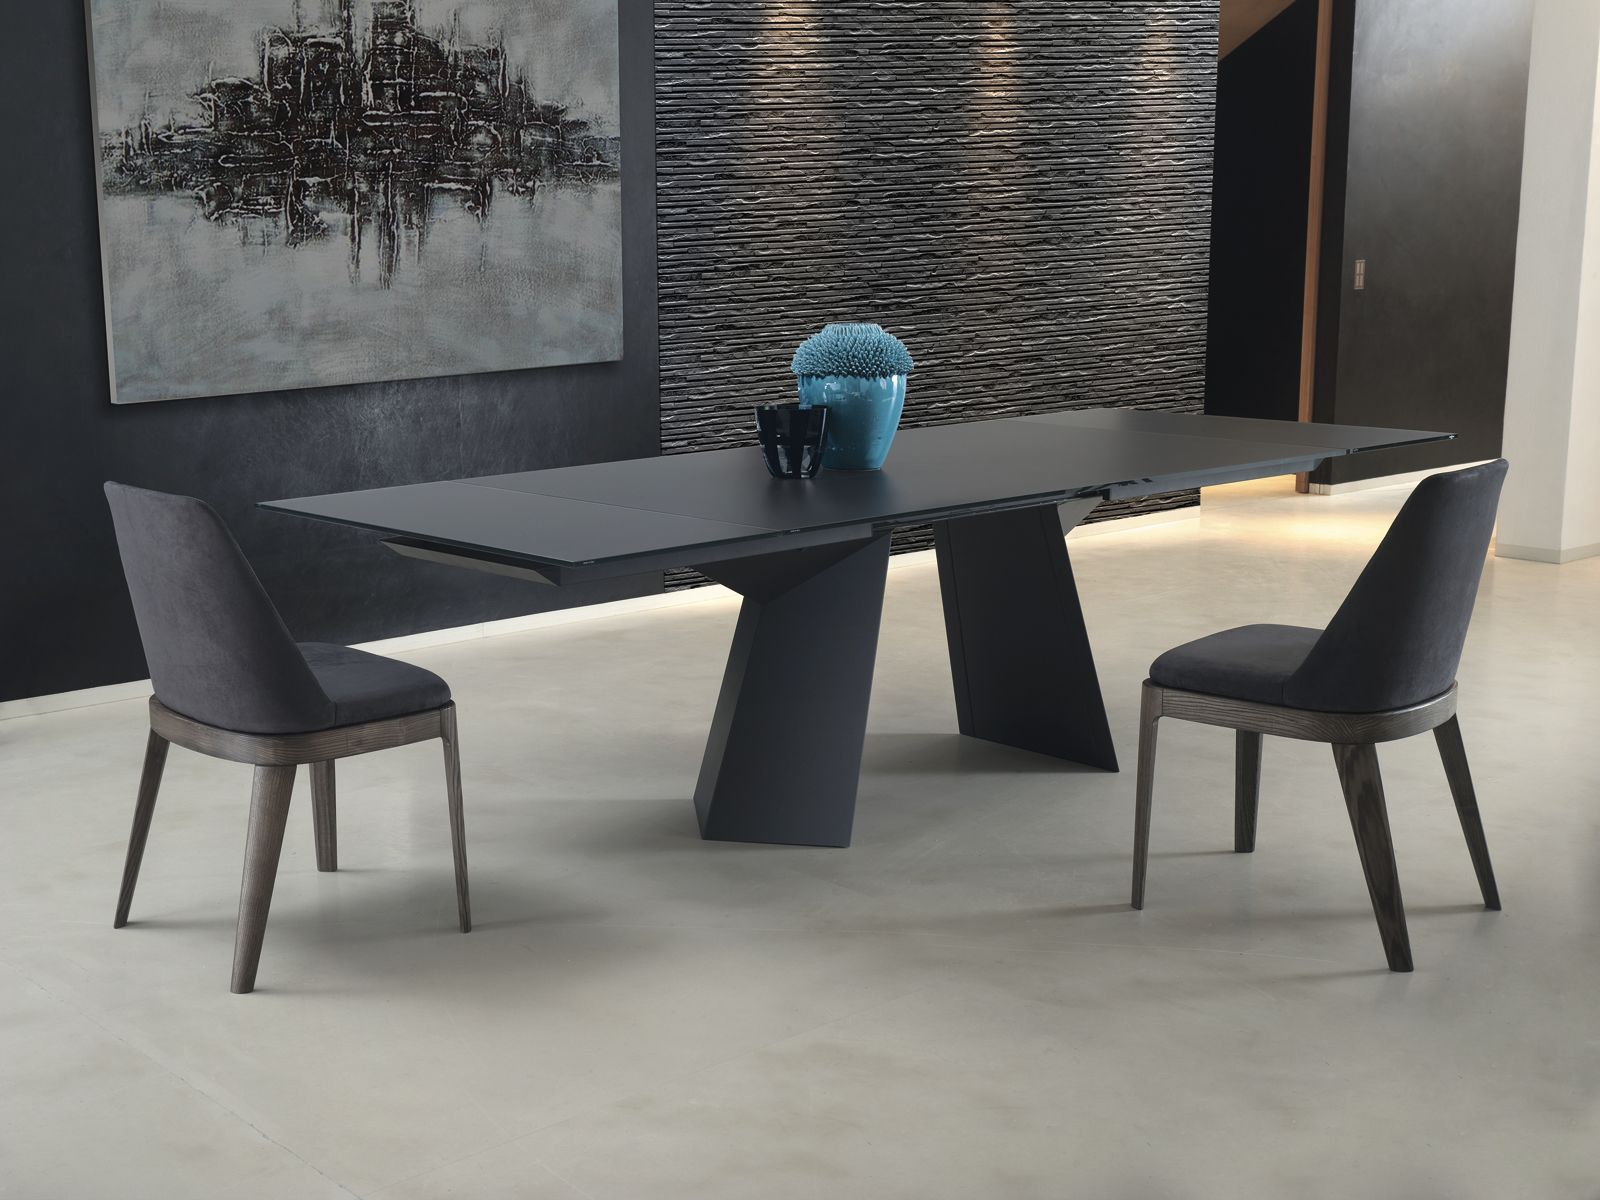 Sedie ingenia ~ Bontempi mobili tavoli sedie complementi divani letti